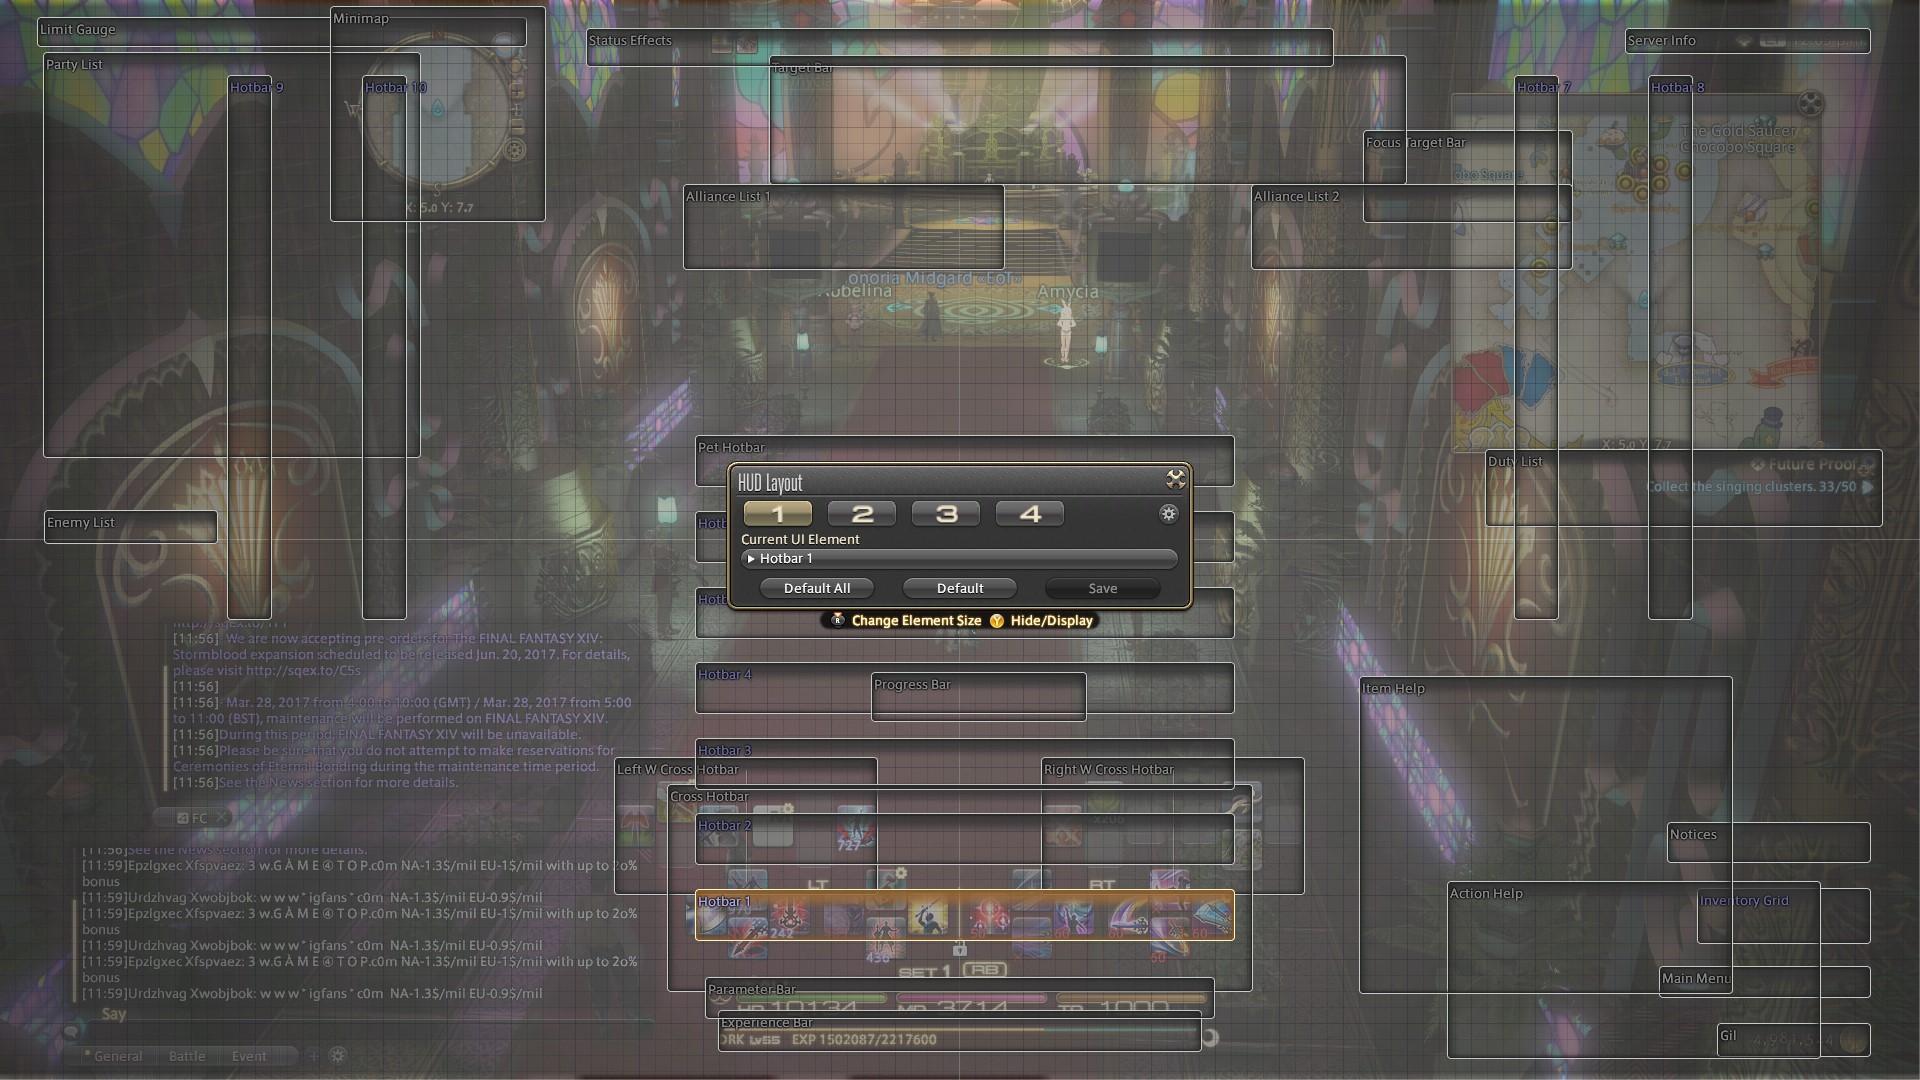 Final Fantasy XIV / Впечатления от трёх месяцев игры в FFXIV